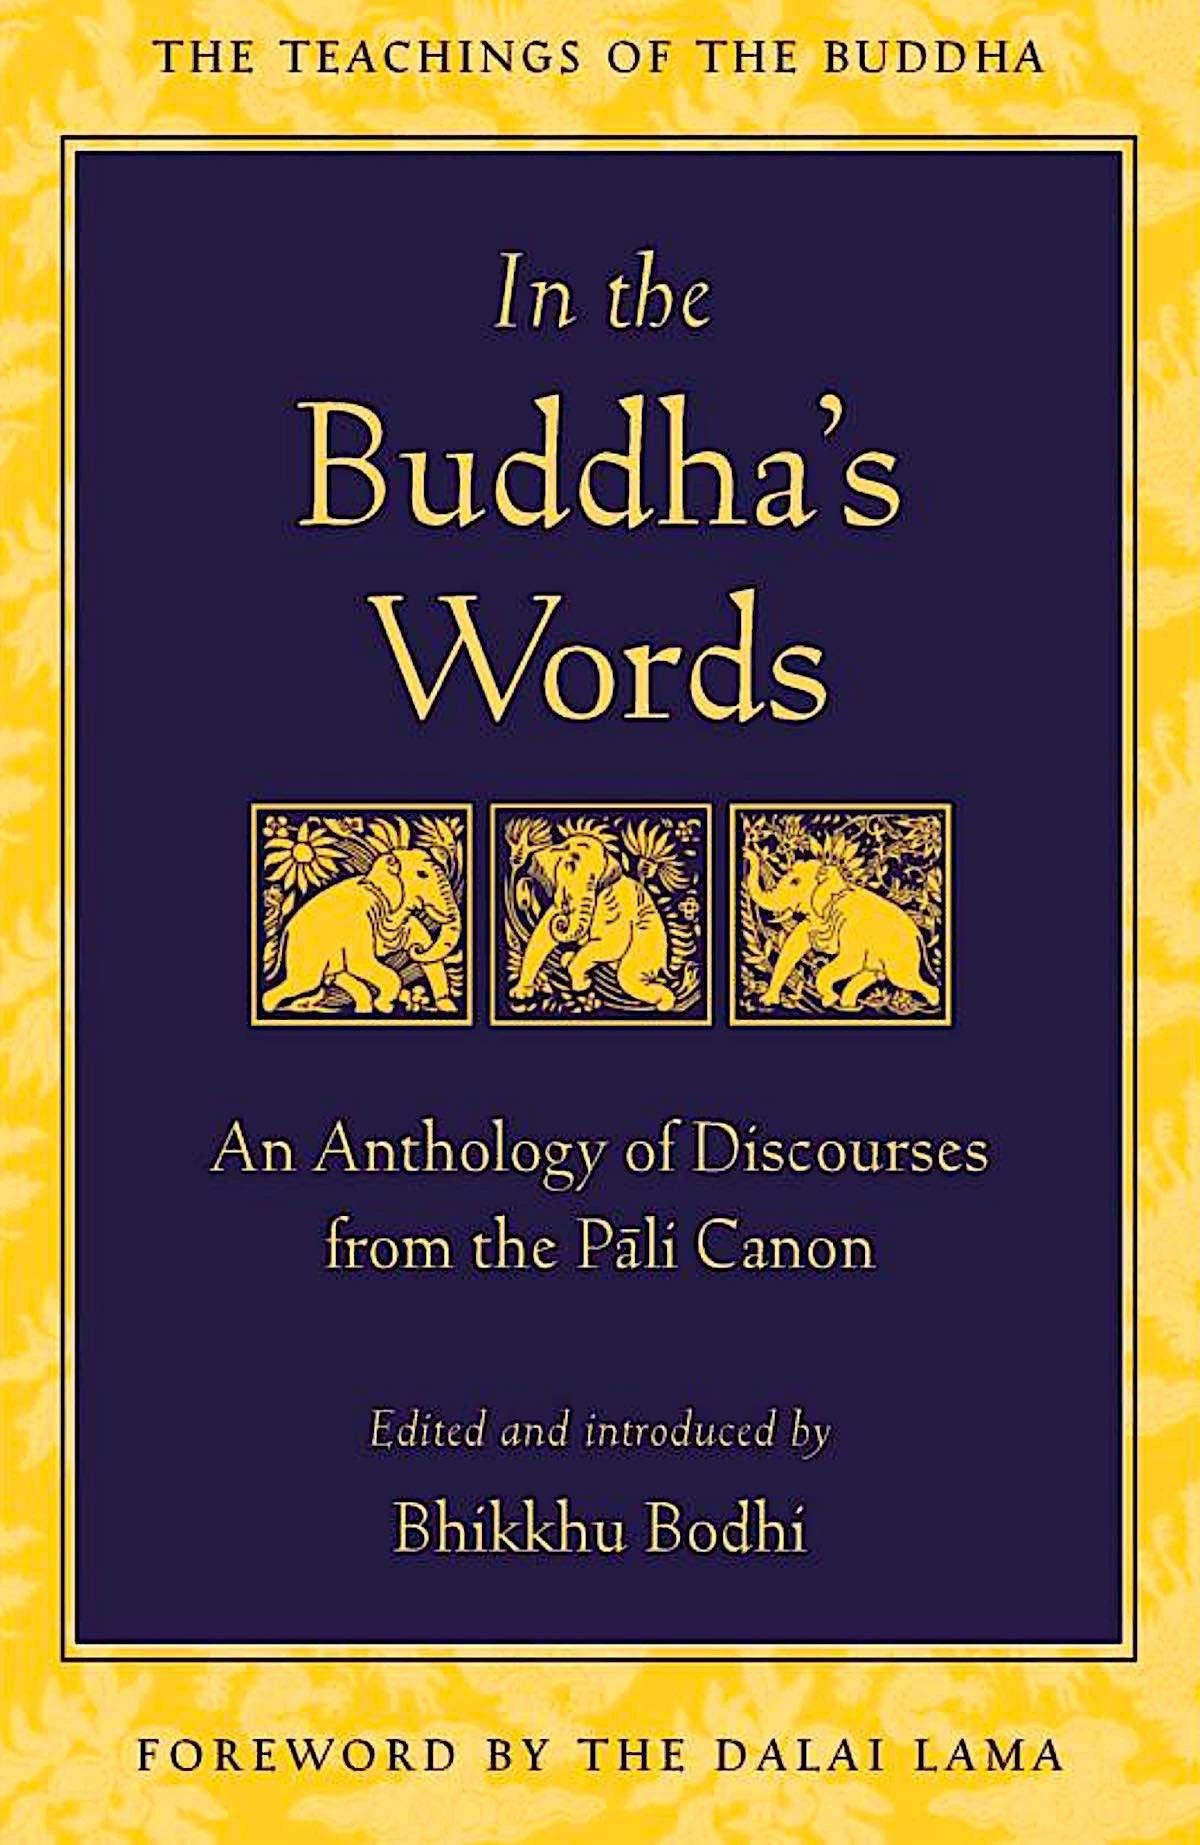 Buddha Weekly In the Buddhas Words Pali Canon Buddhism 2